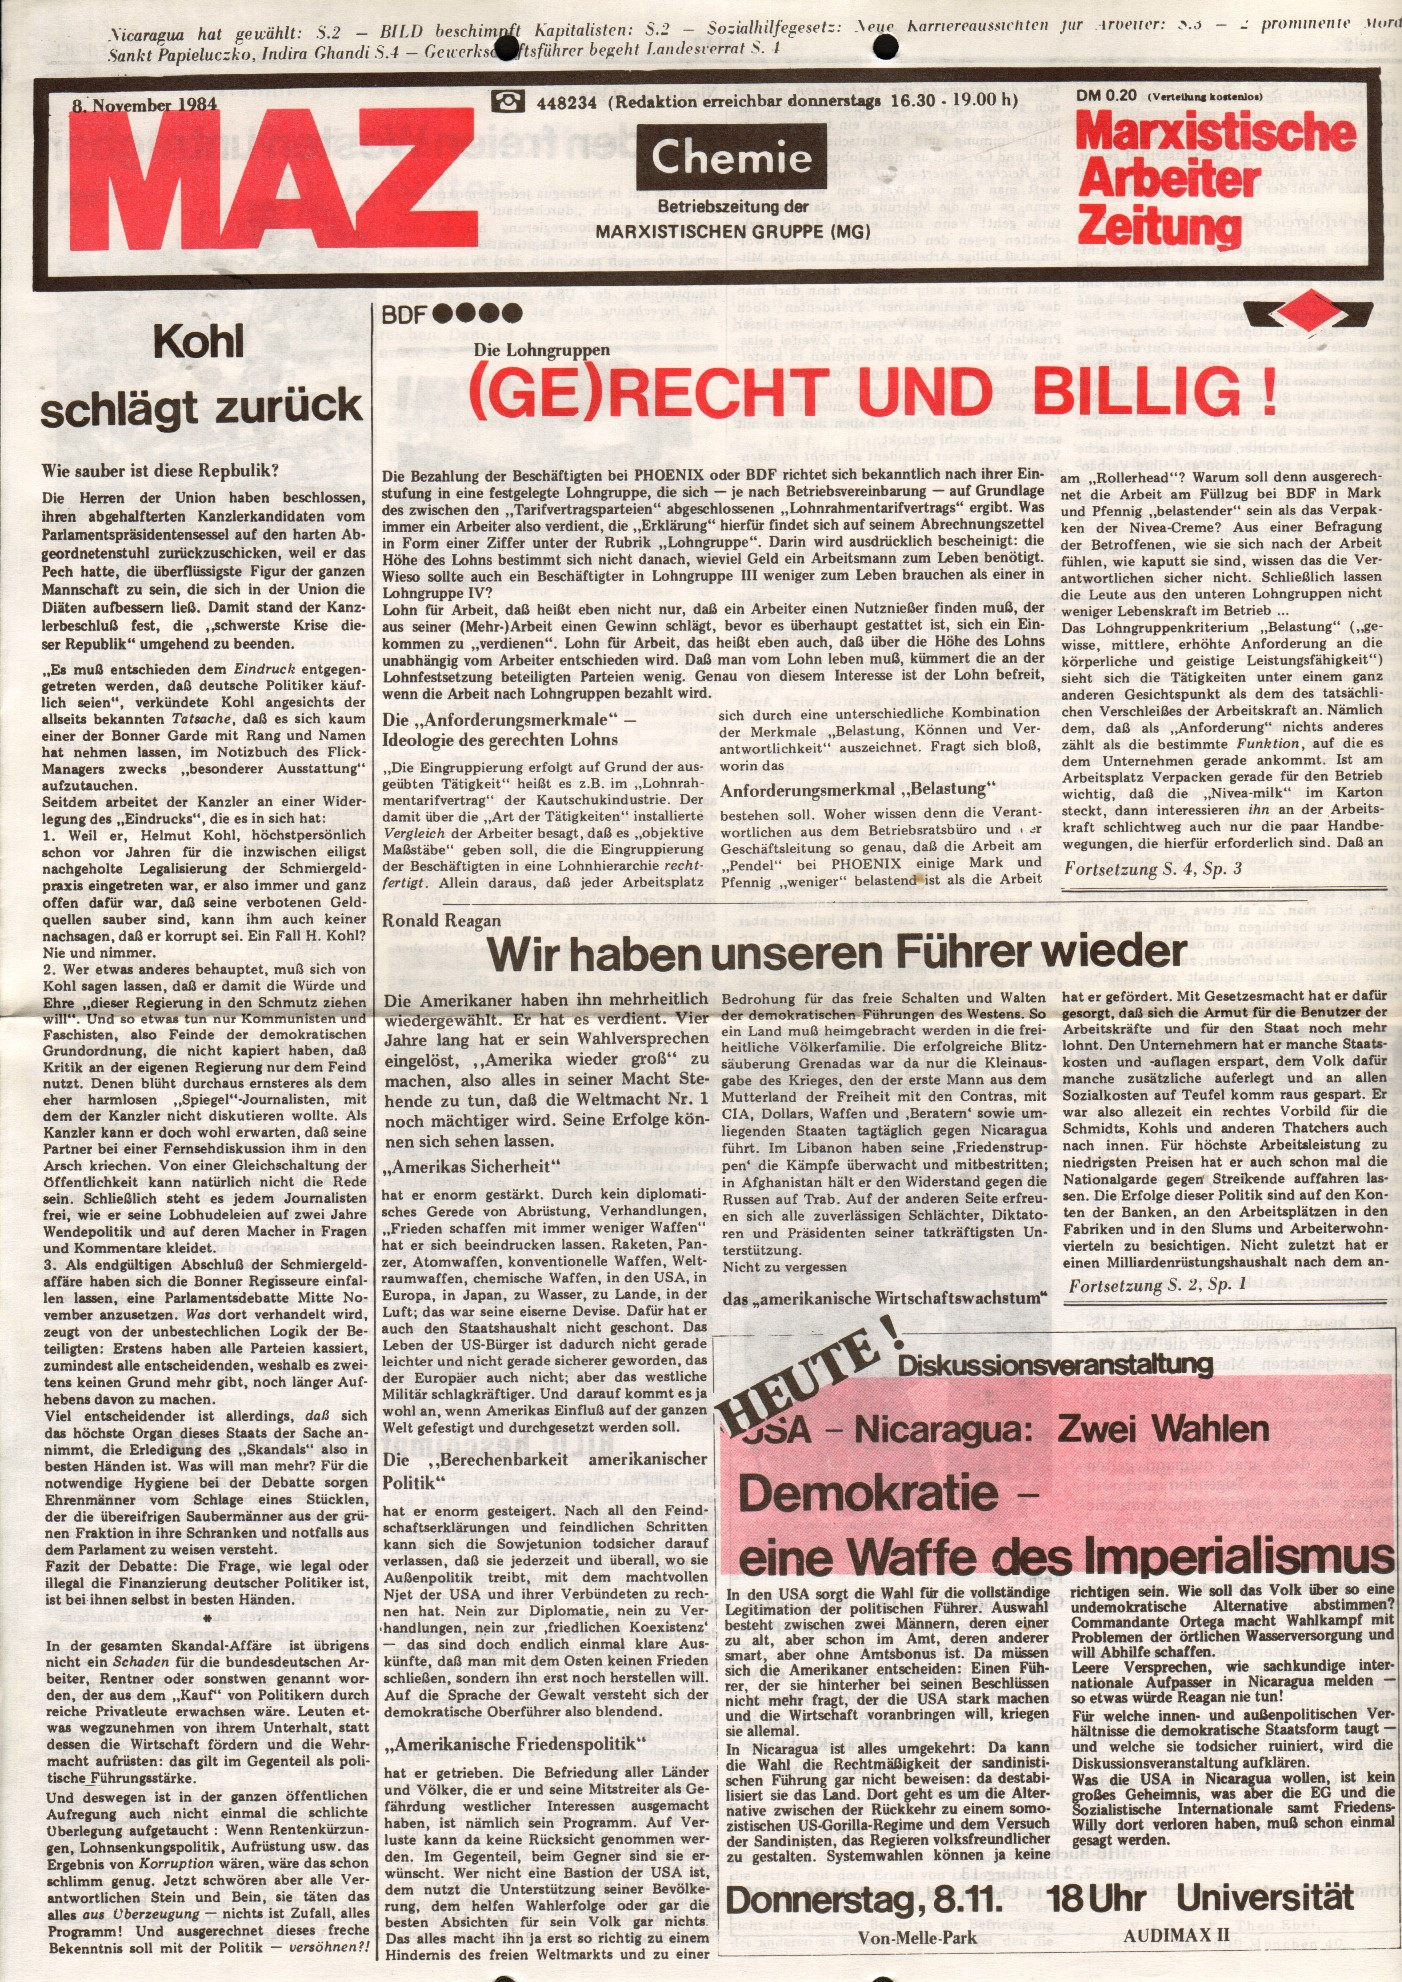 Hamburg_MG_MAZ_Chemie_19841108_01